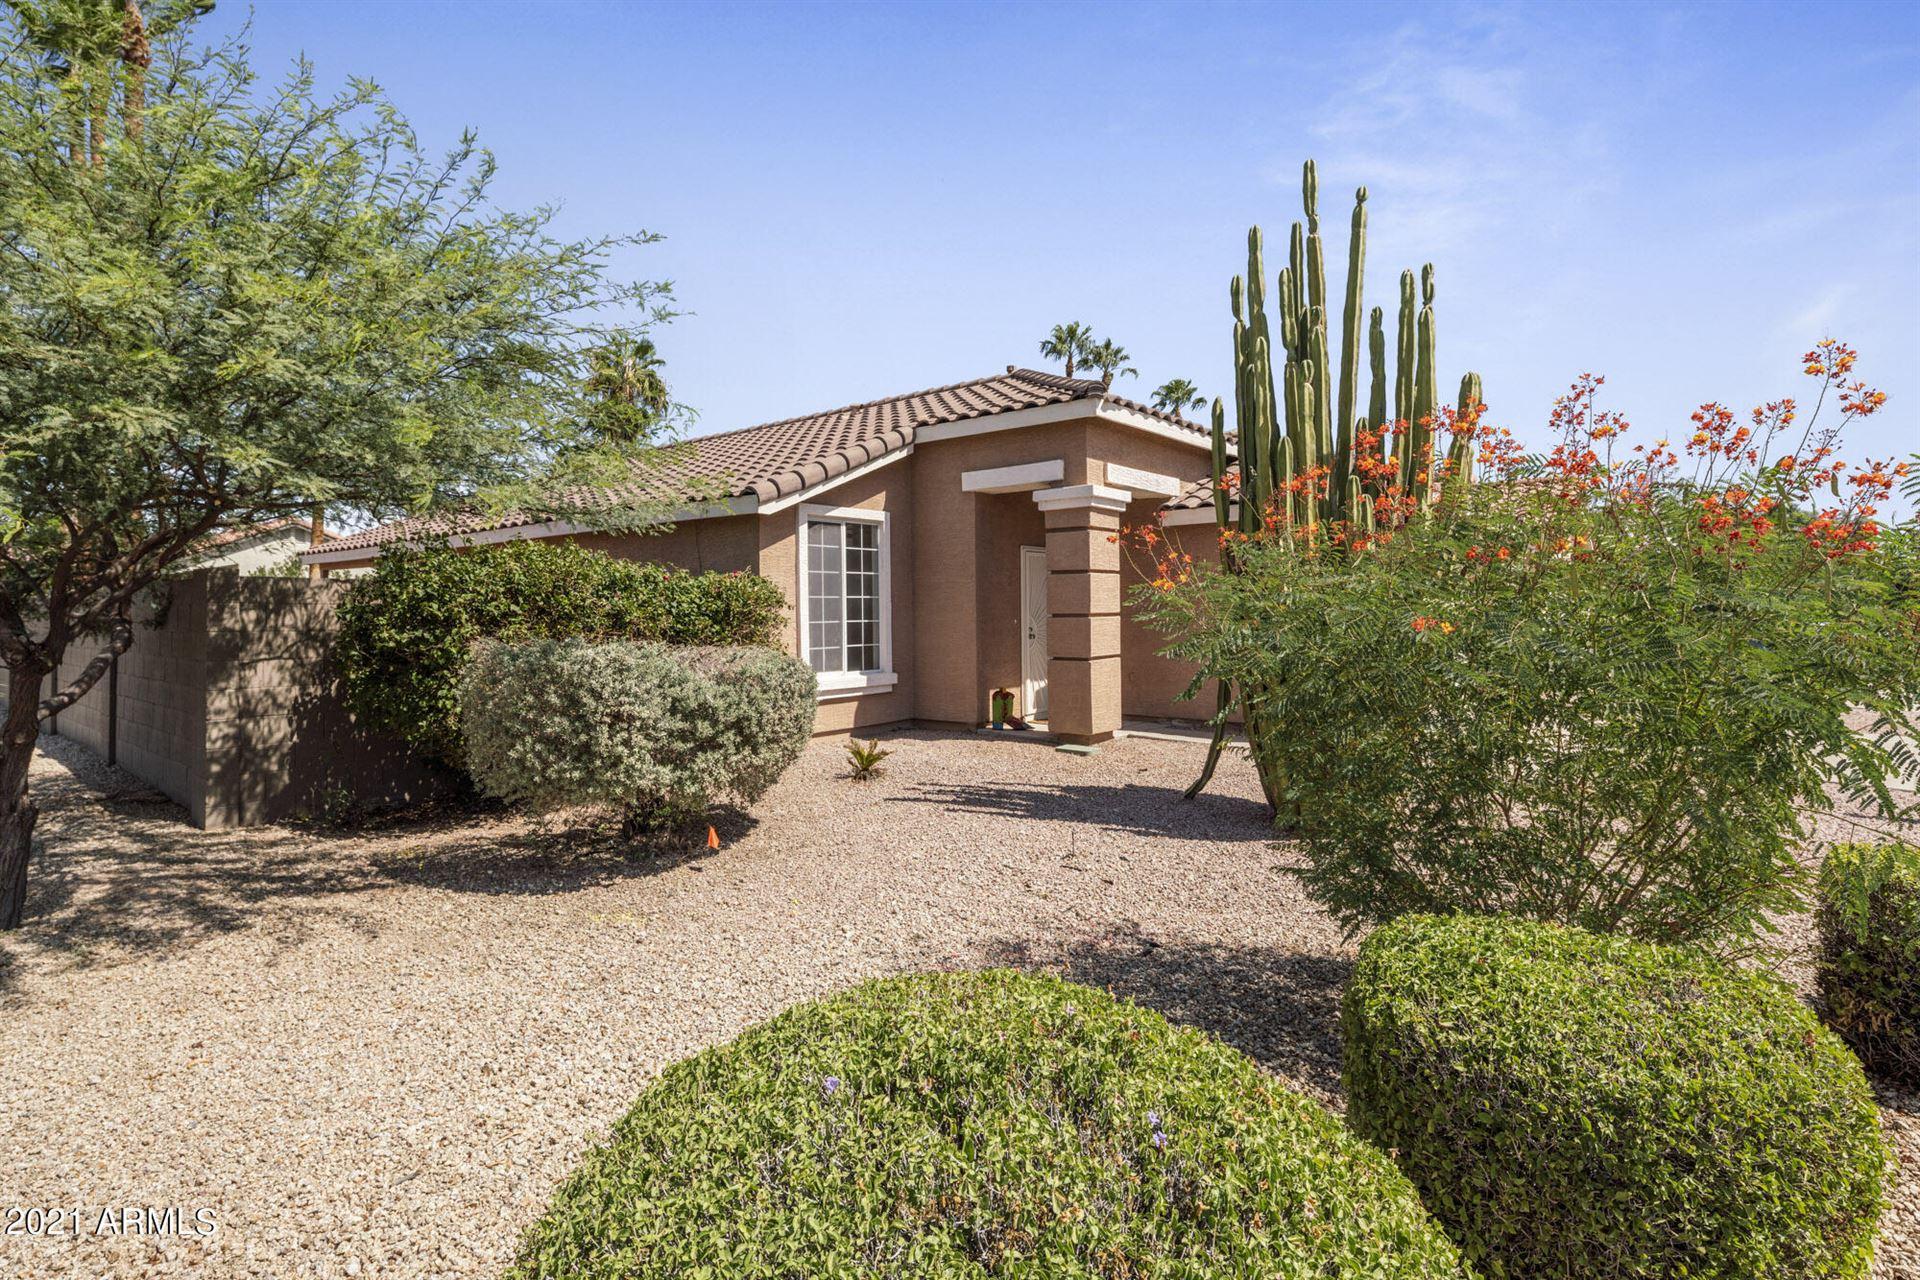 2254 E BROWNING Place, Chandler, AZ 85286 - MLS#: 6297789